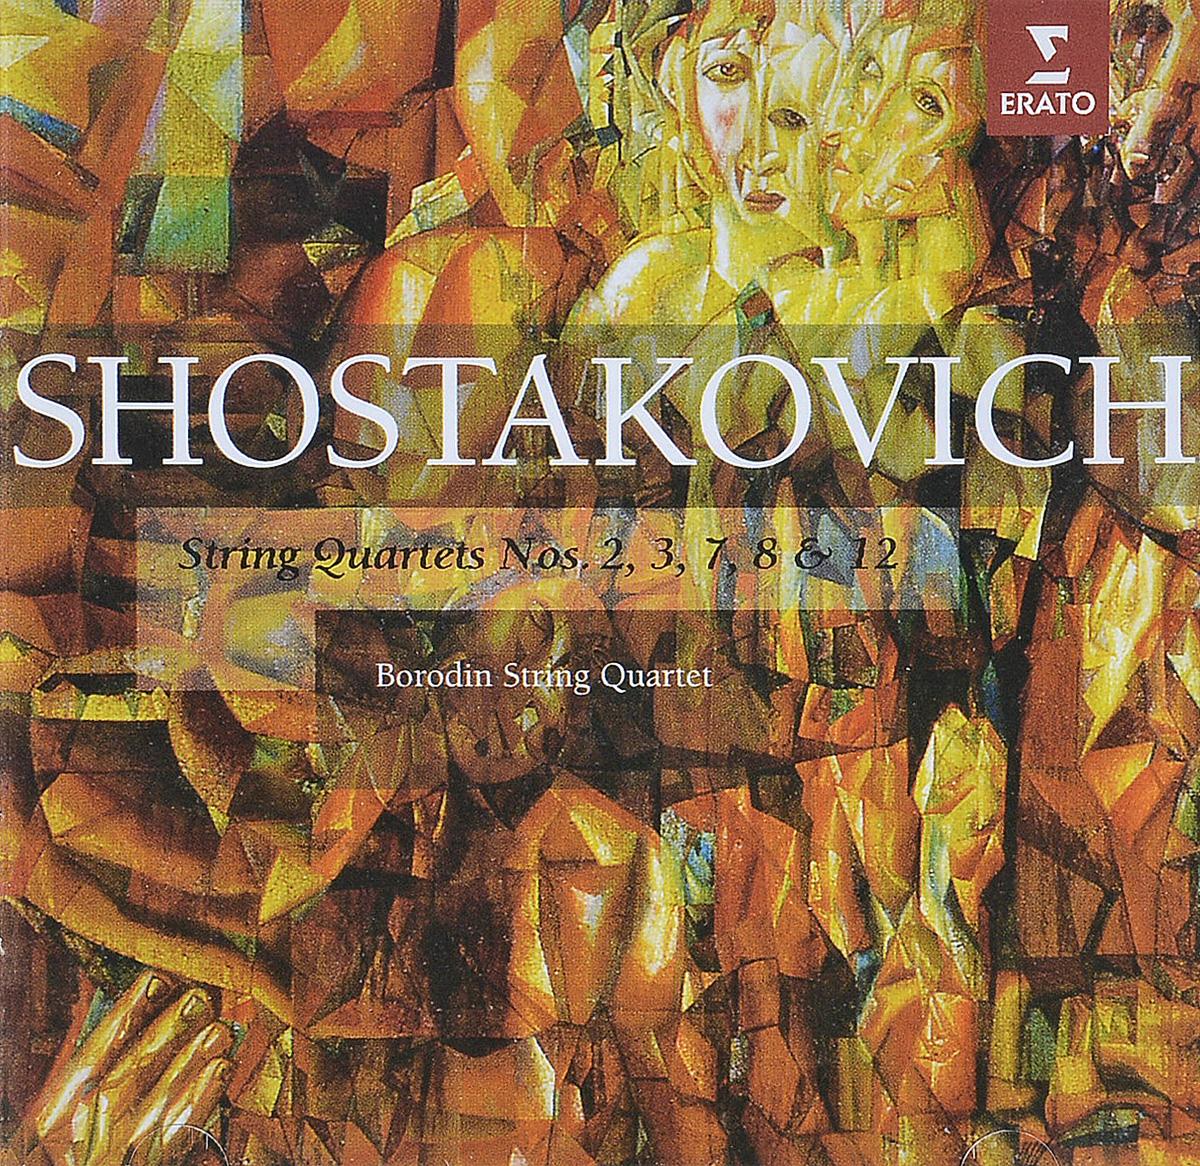 Дмитрий Шостакович Dmitri Shostakovich. Streichquartett Nr.2, 3, 7, 8, 12 (2 CD) spectral classics pl151 bg 2 boxes